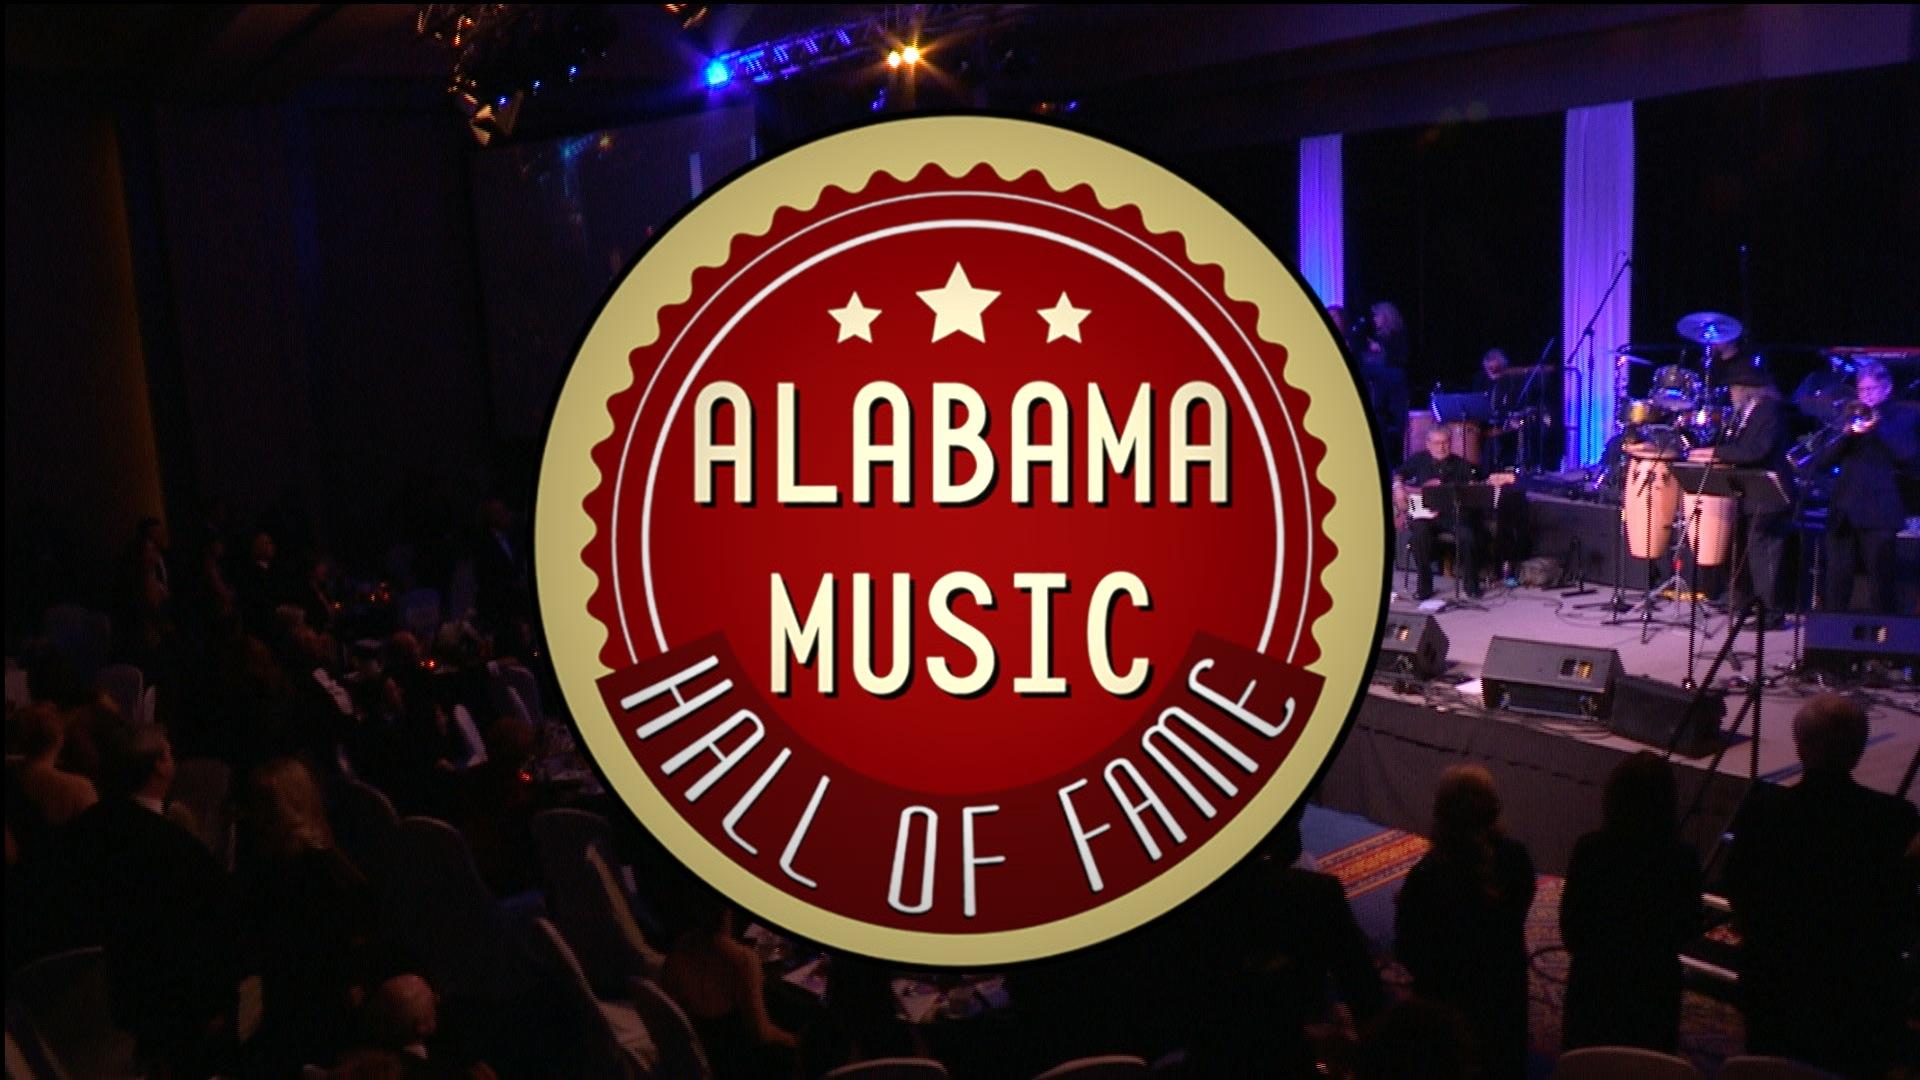 AlabamaMusicHallofFmae